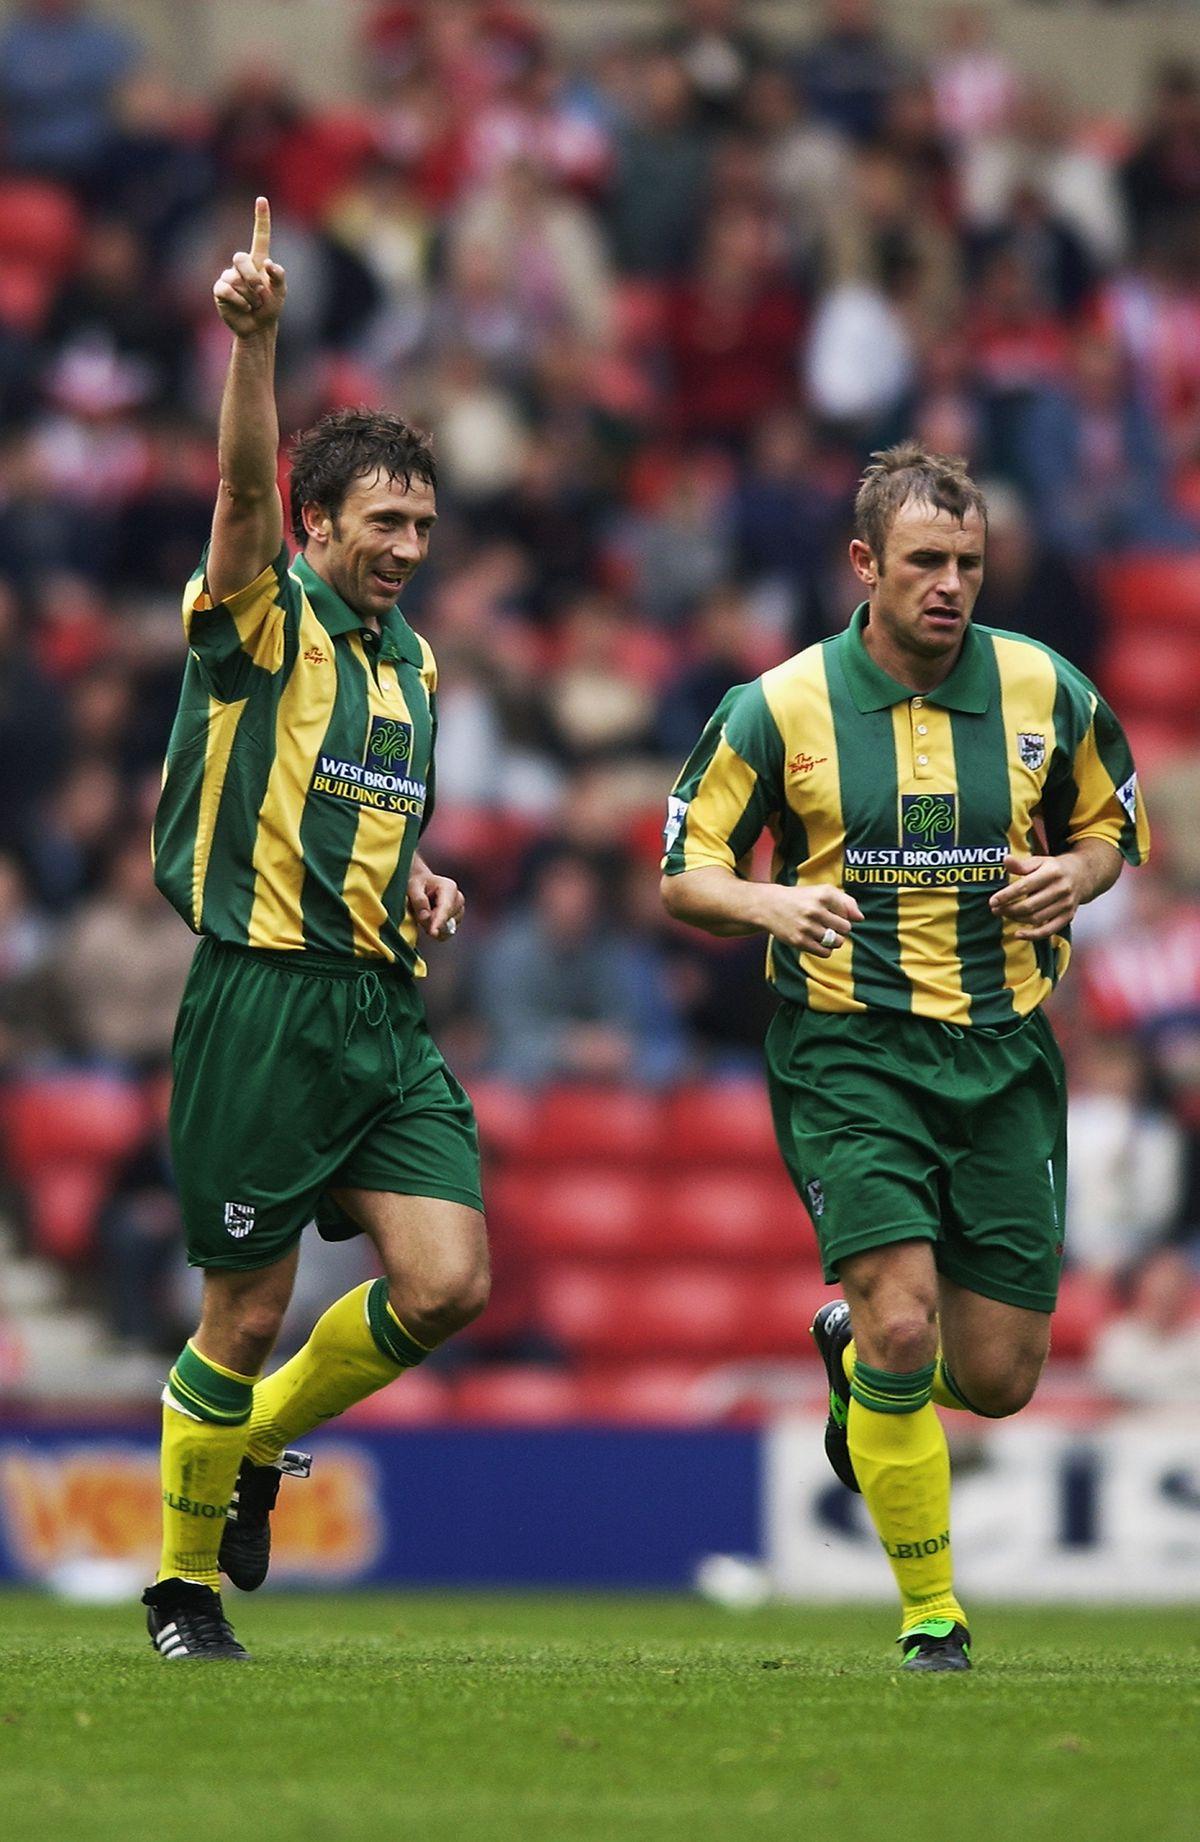 Derek McInnes of West Bromwich Albion celebrates his first goal